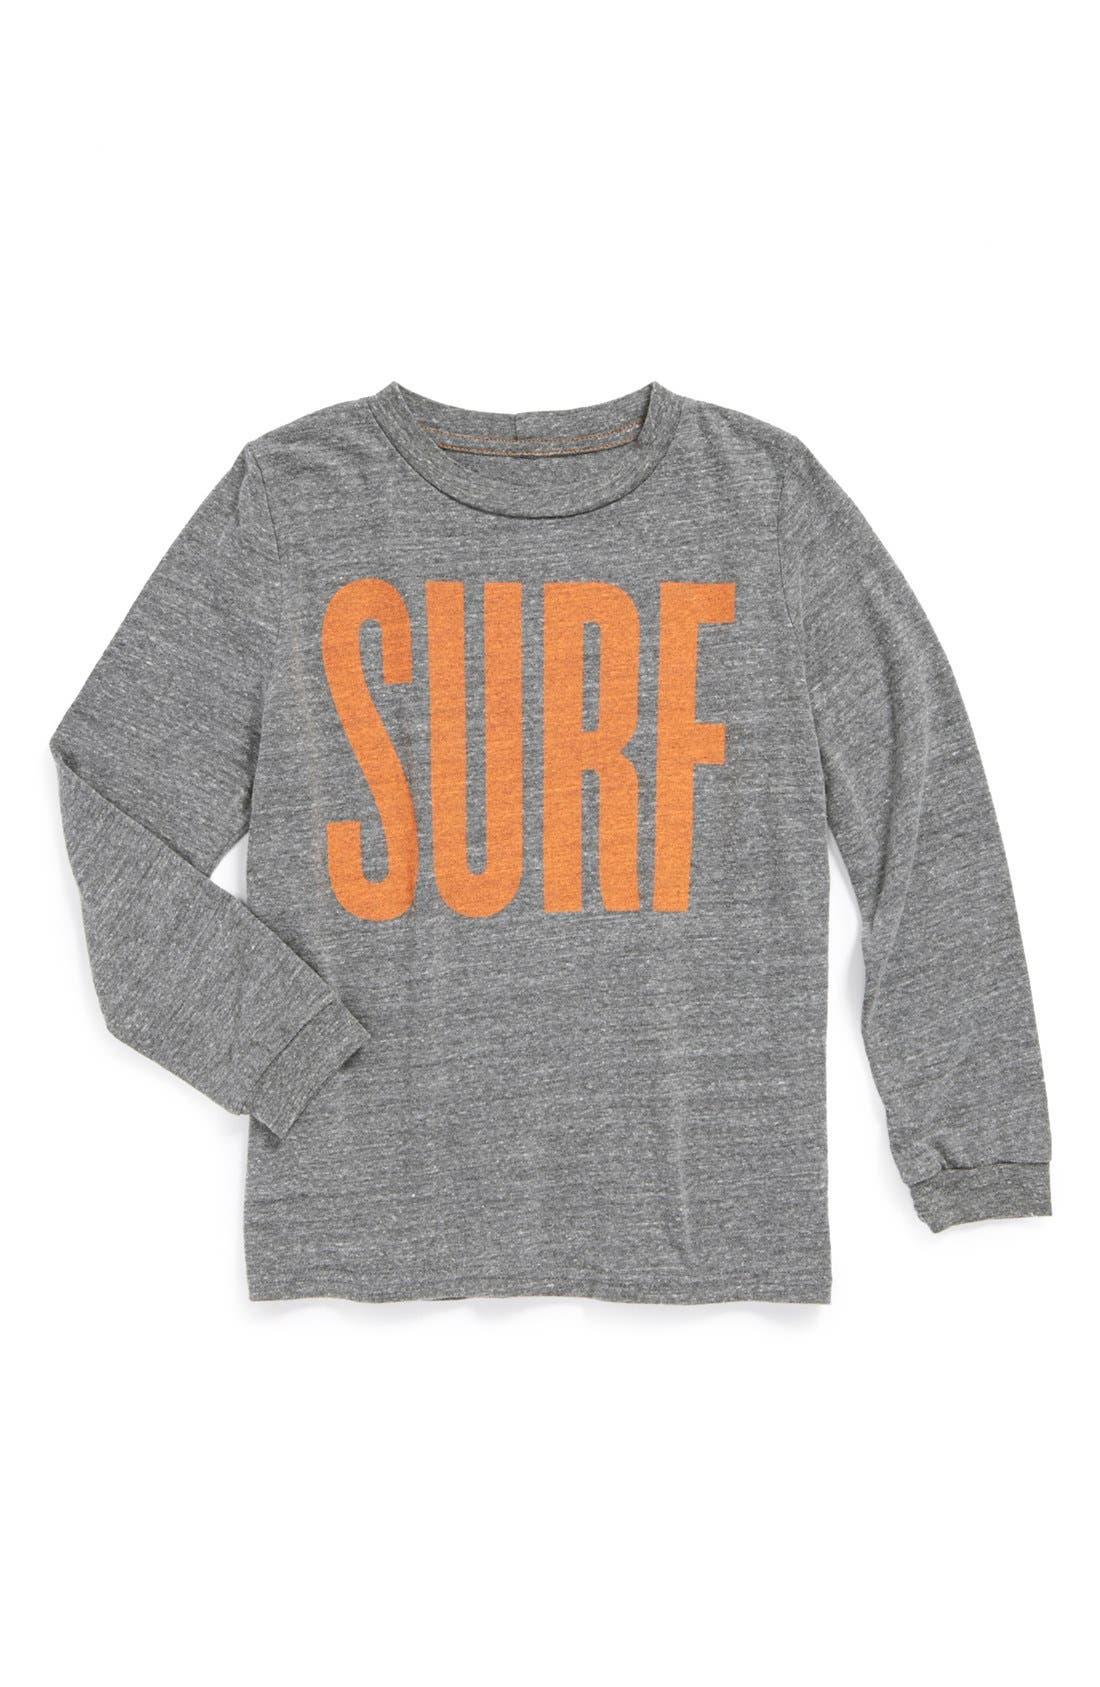 Alternate Image 1 Selected - Peek 'Surf' T-Shirt (Big Boys)